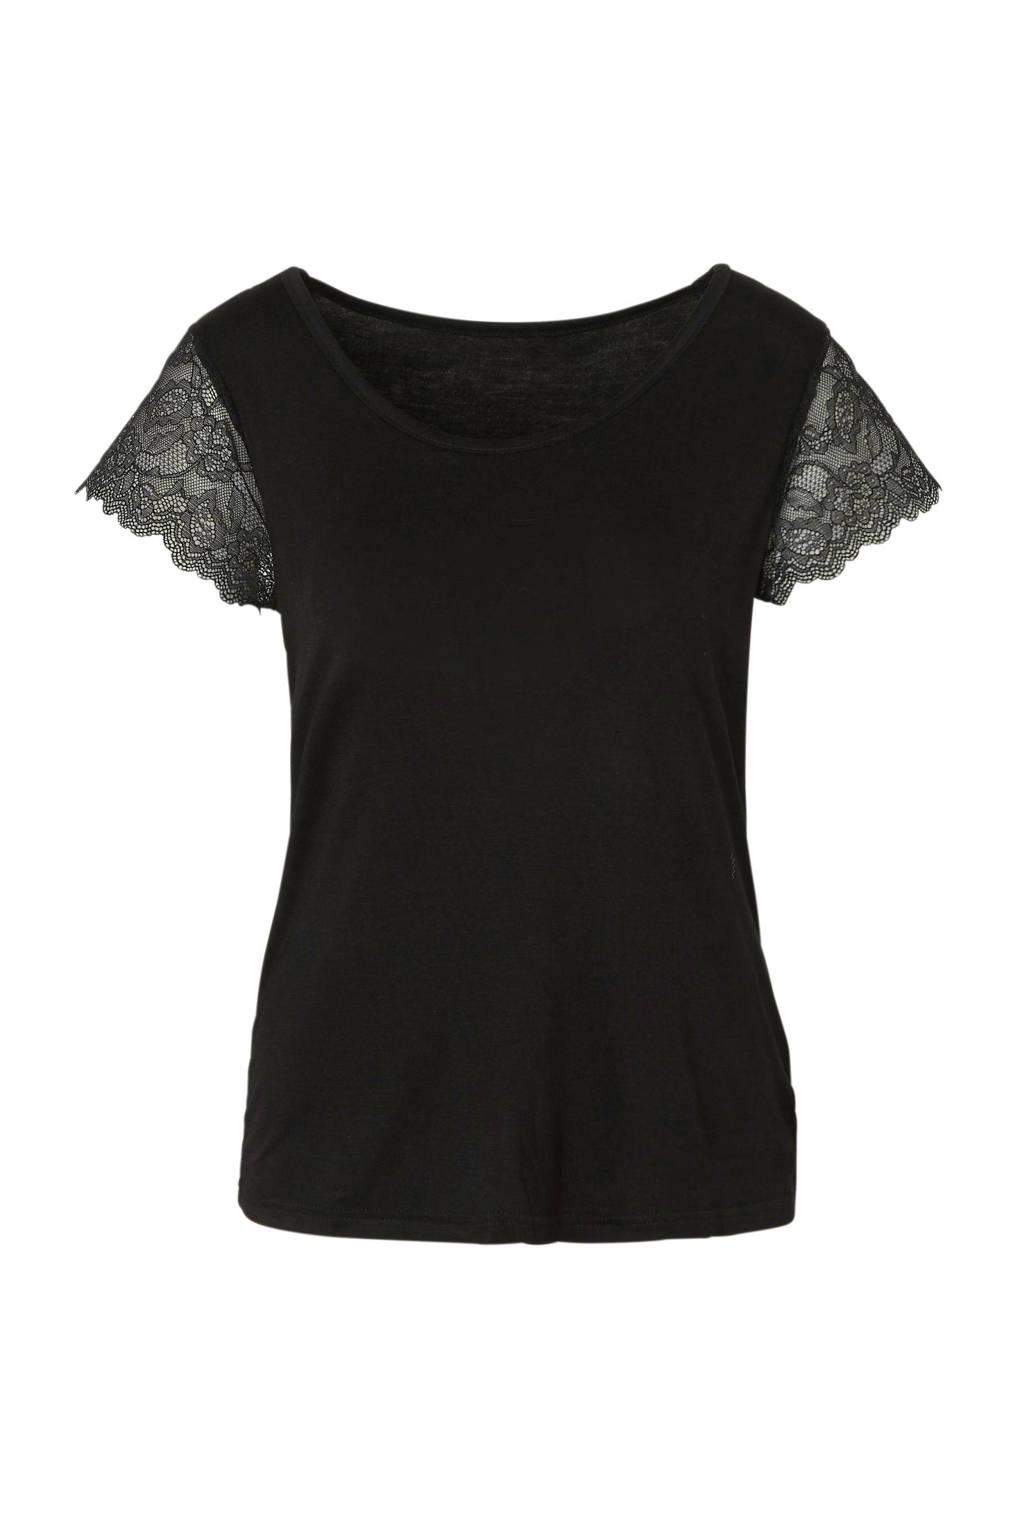 Sassa Mode pyjamatop met kant zwart, Zwart